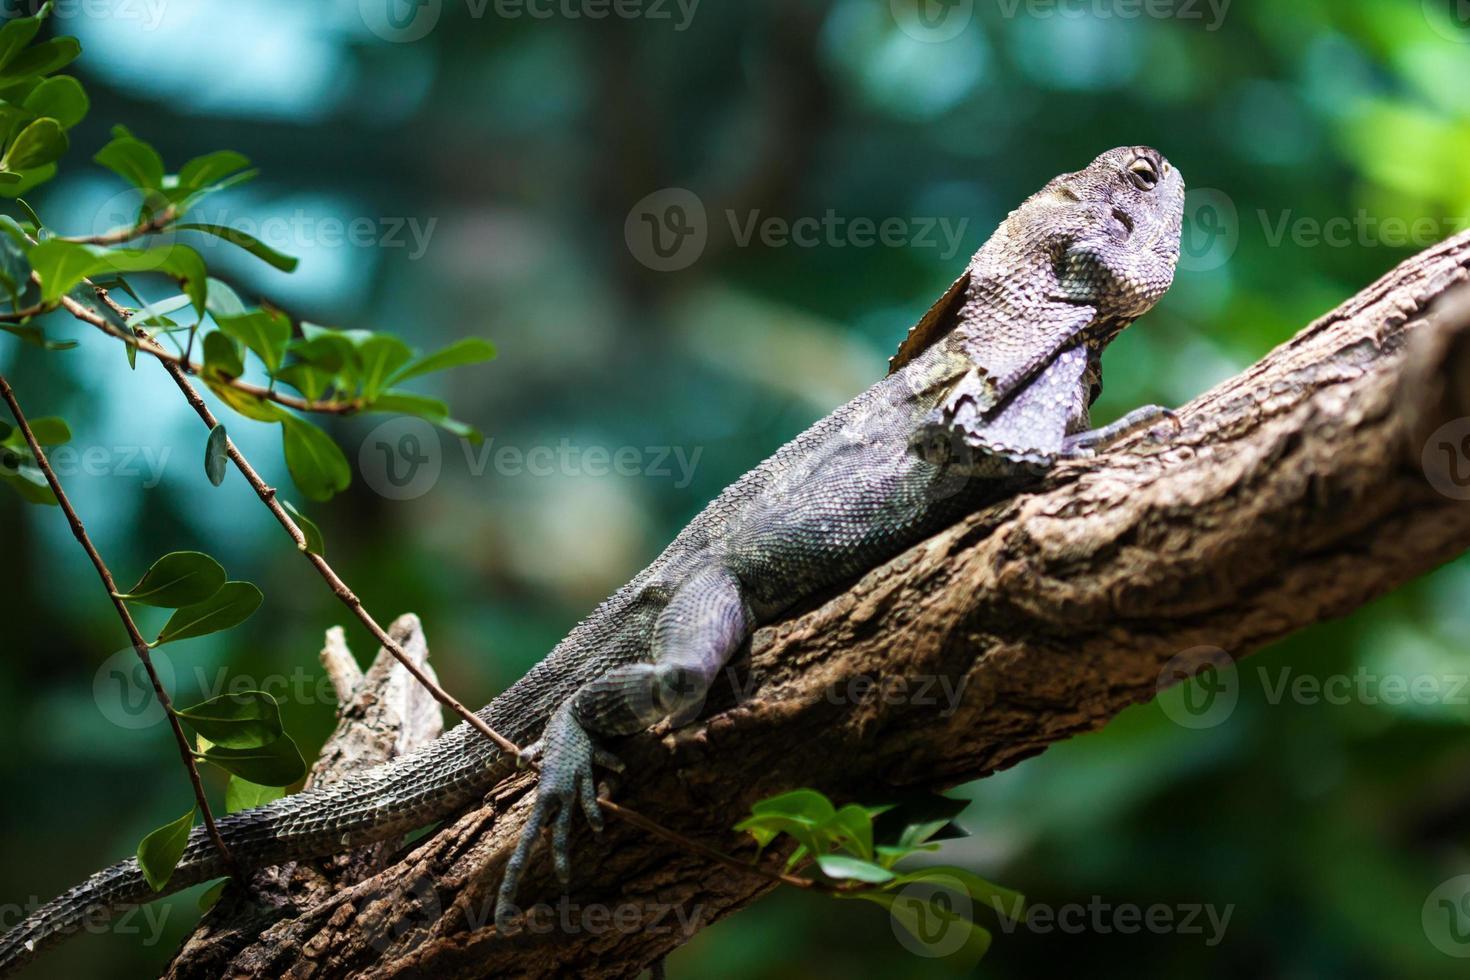 Frill-necked lizard (Chlamydosaurus kingii) photo